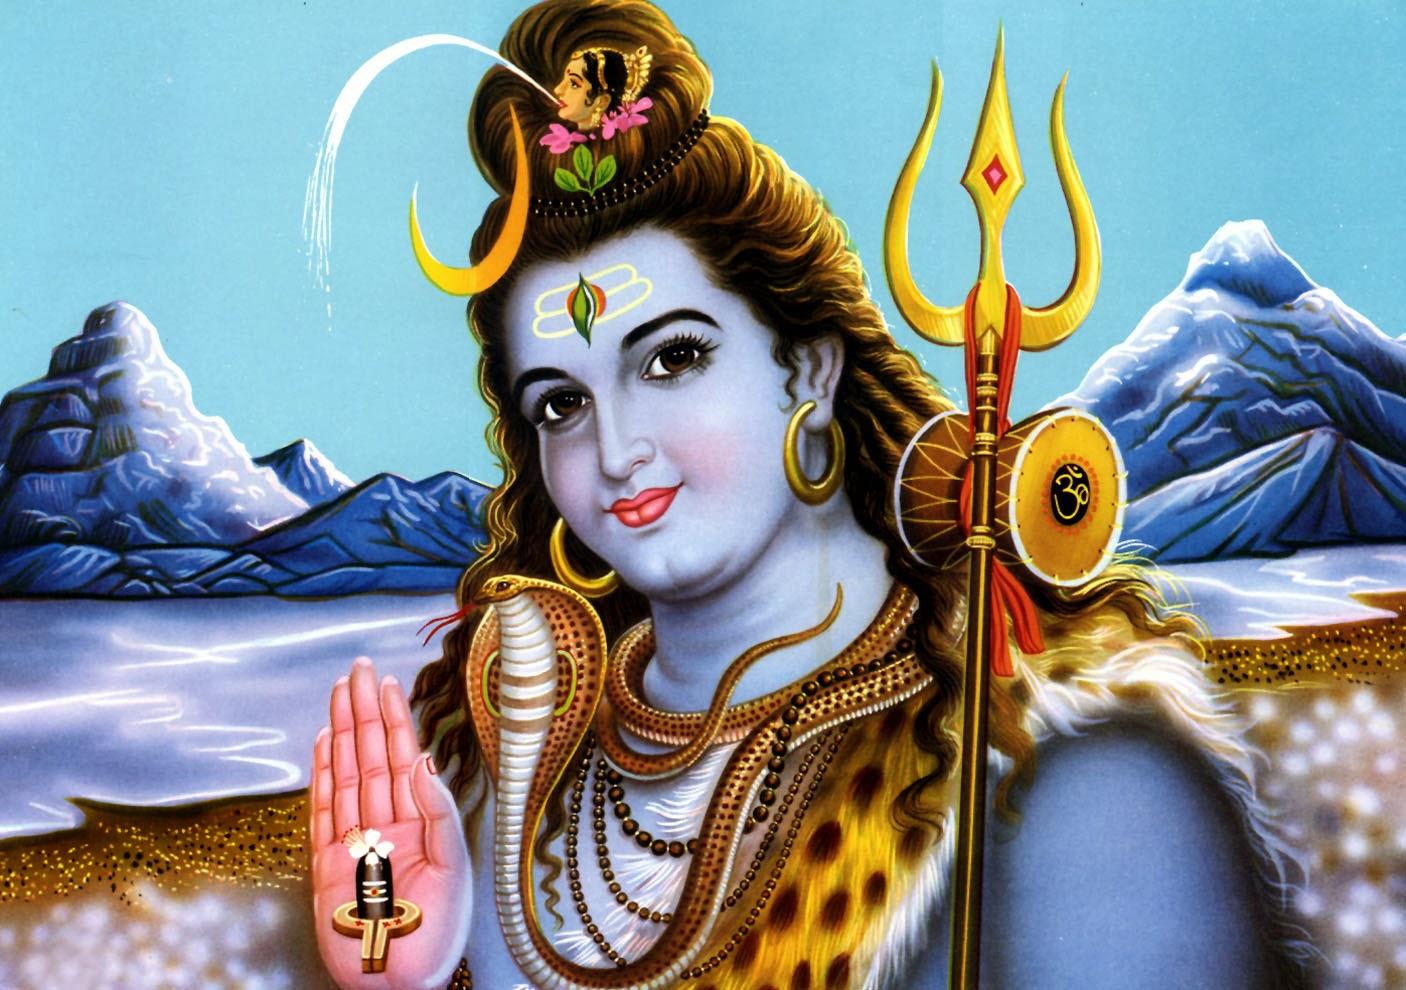 Download Free Top Ten Mahadev Wallpapersphotos Images For